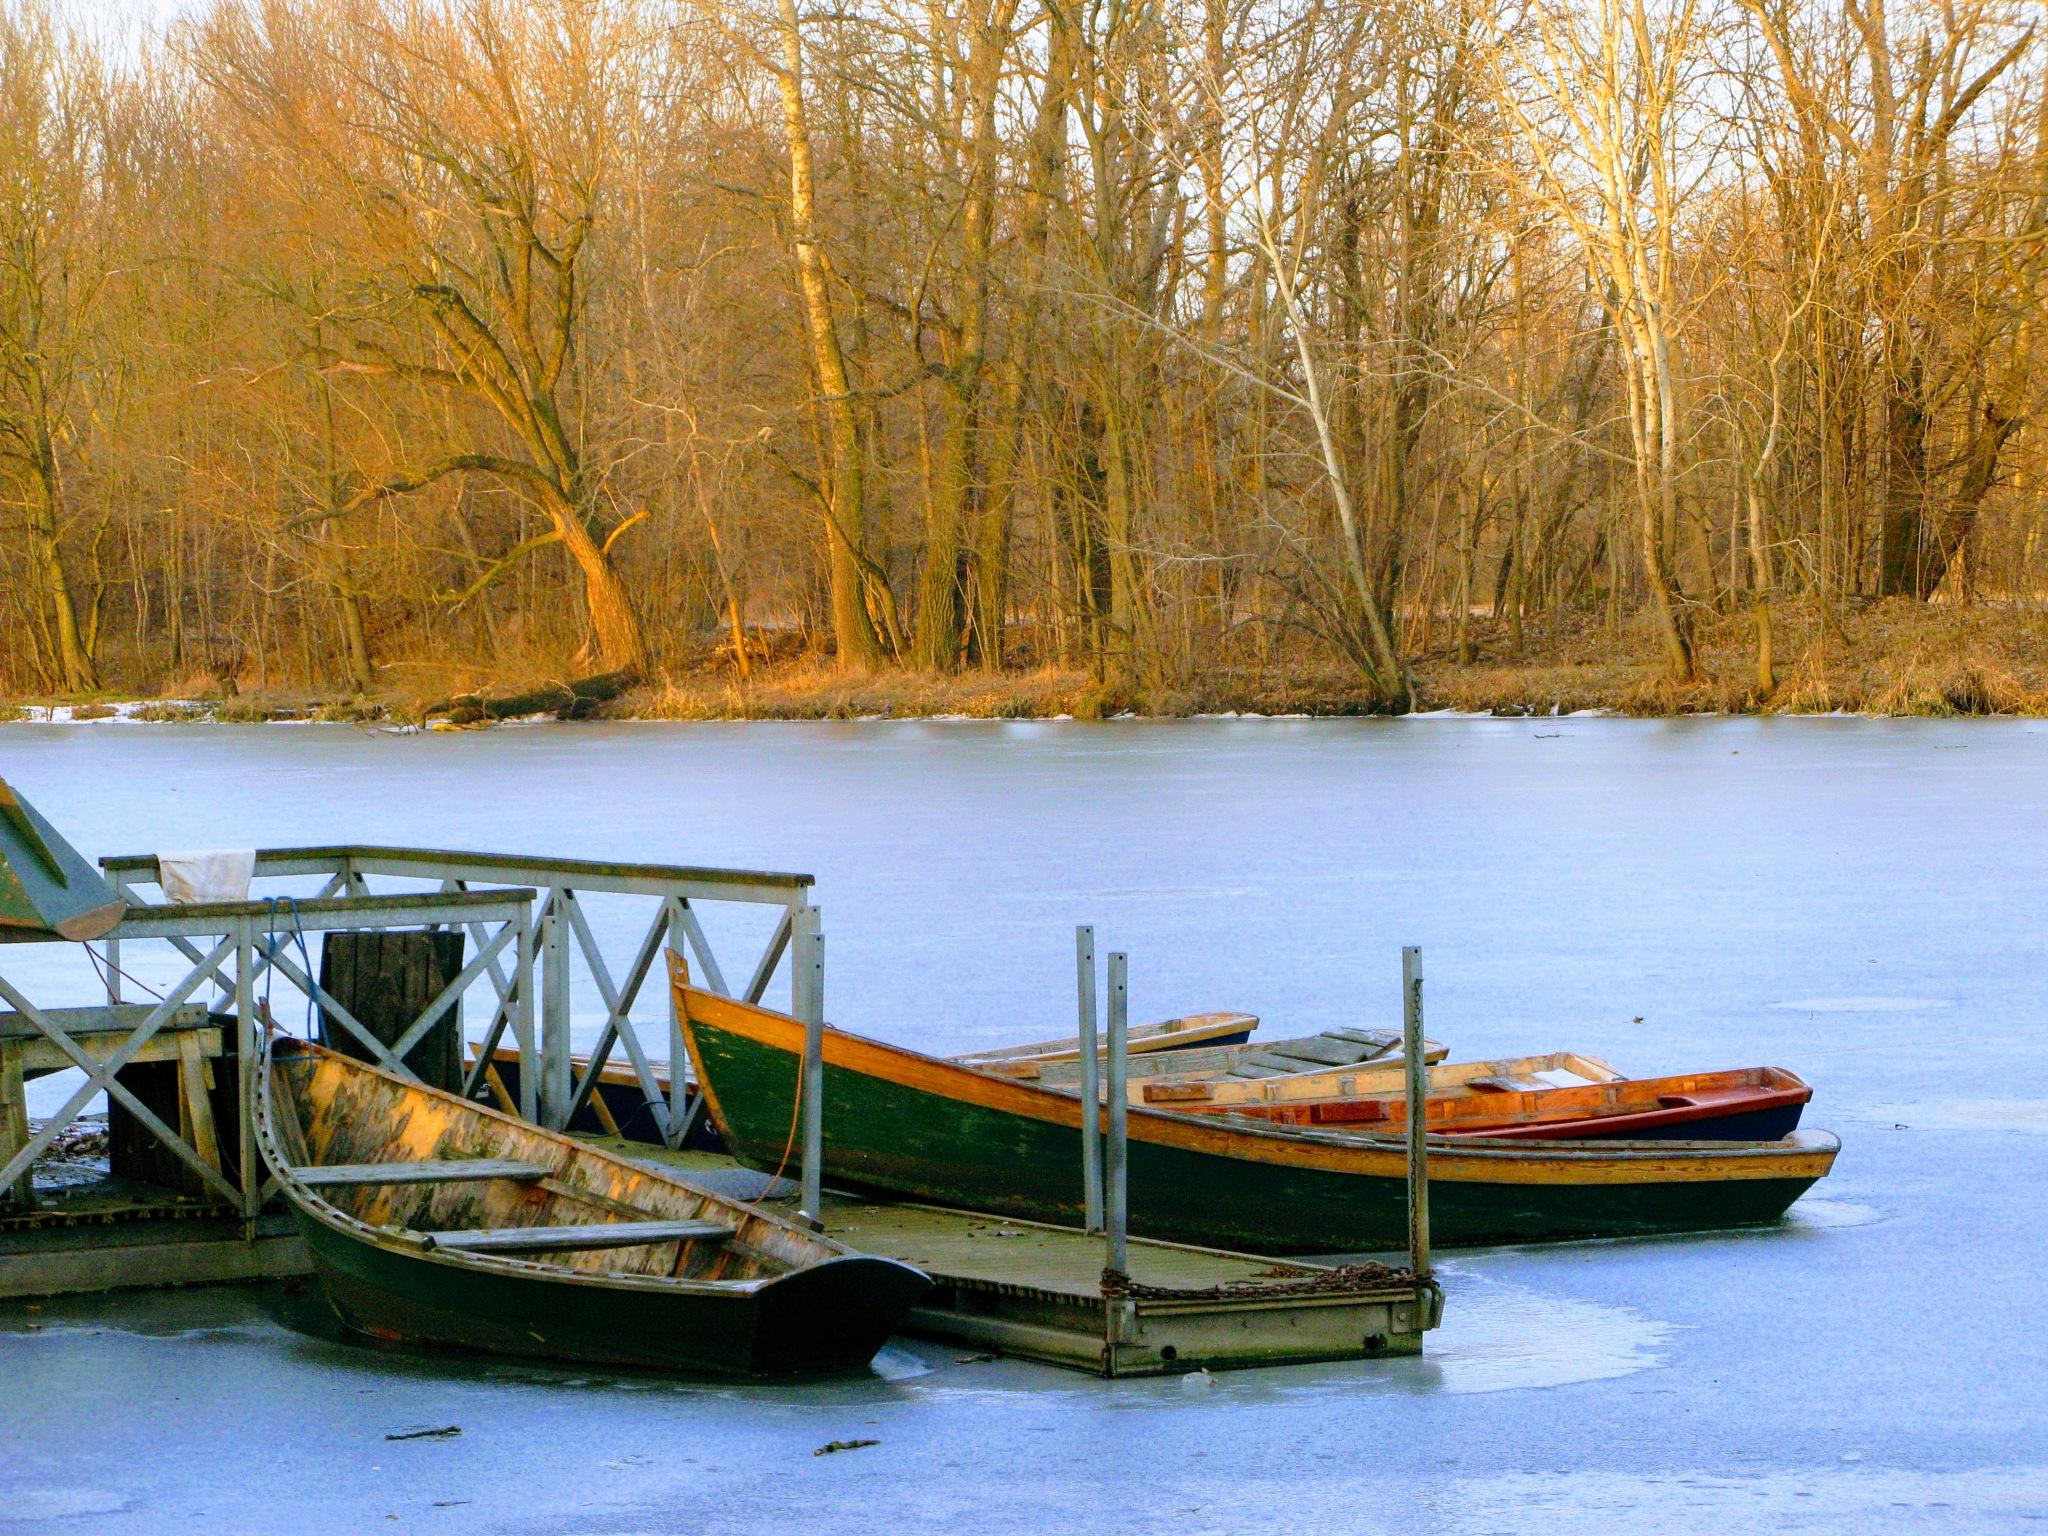 Boats on the frozen lake by Ela Gajowska